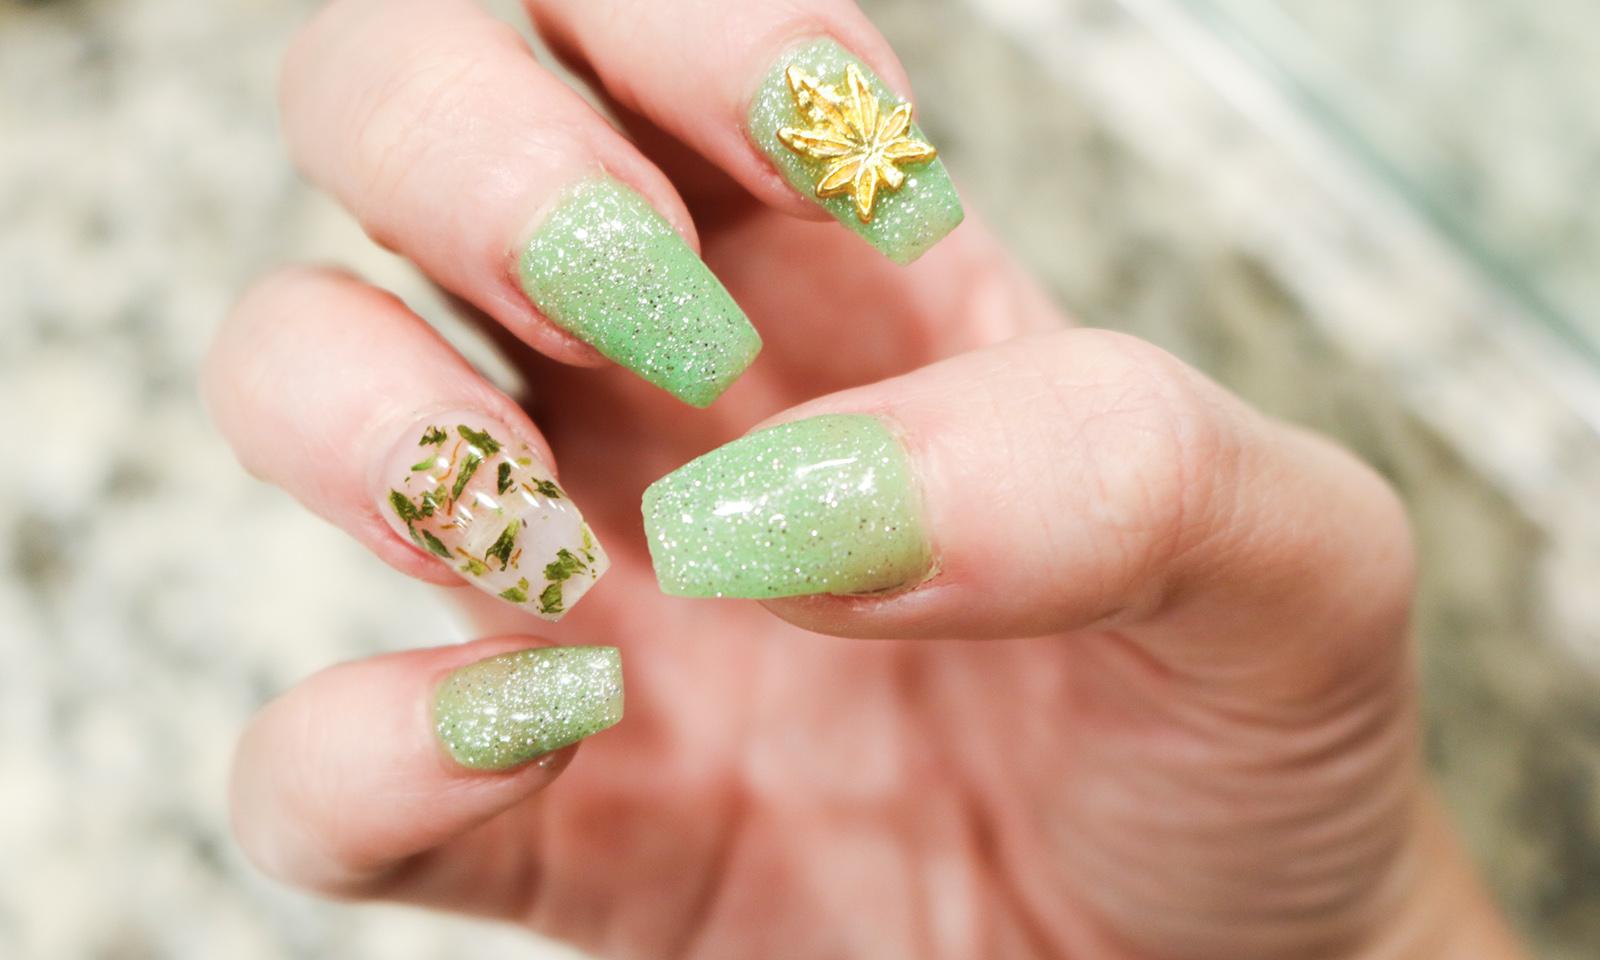 Marijuana Manicures Are Taking Ganja Glam to New Highs